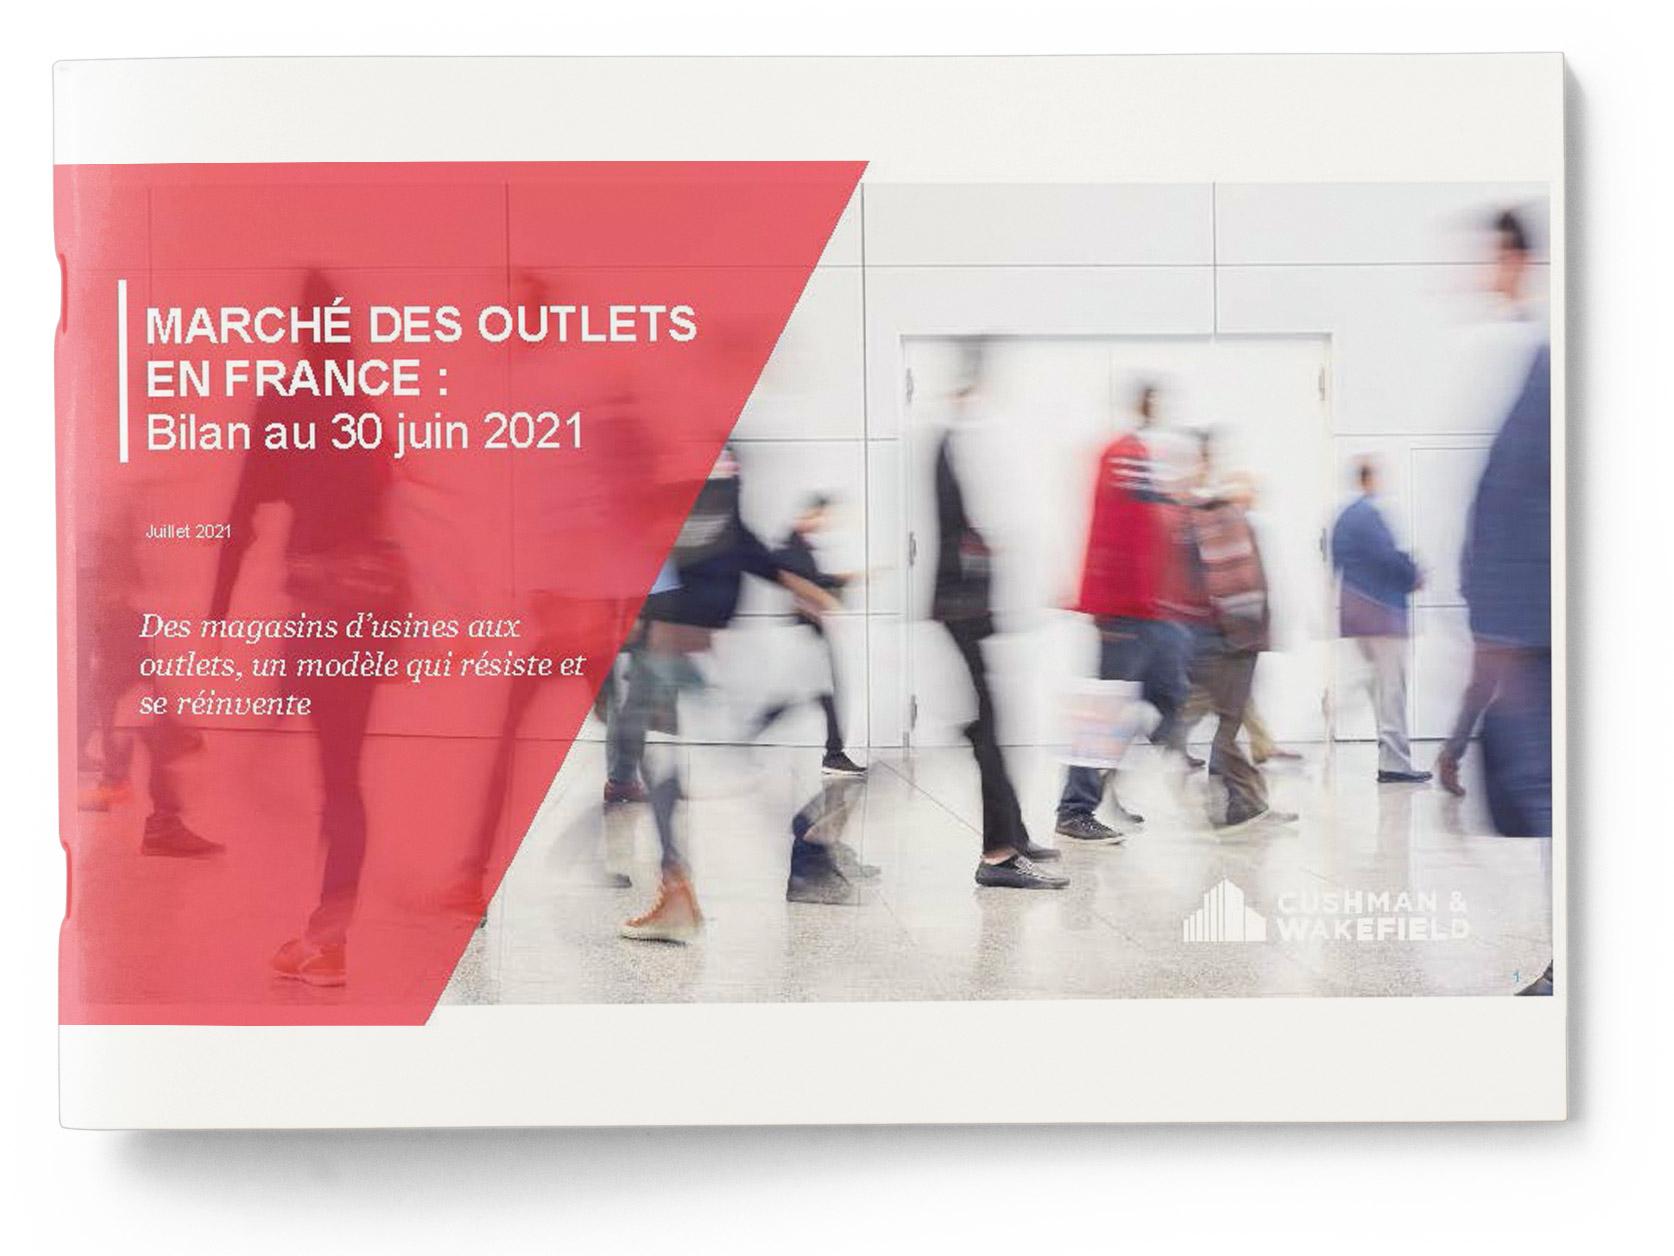 Marché des Outlets en France fin 1er semestre 2021 (cover)